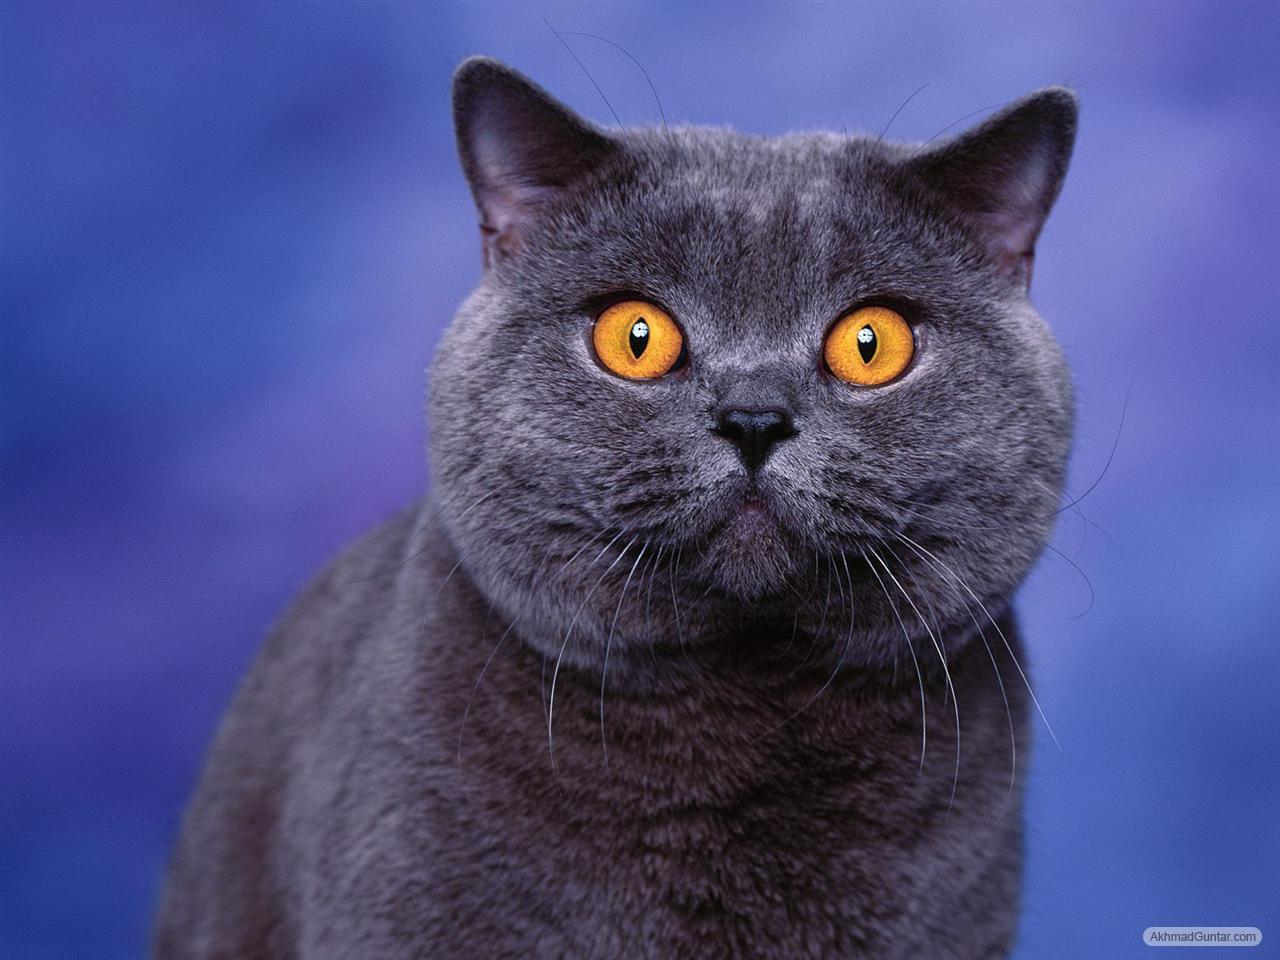 Perawatan Kucing Kucing Hitam Imut Lucu